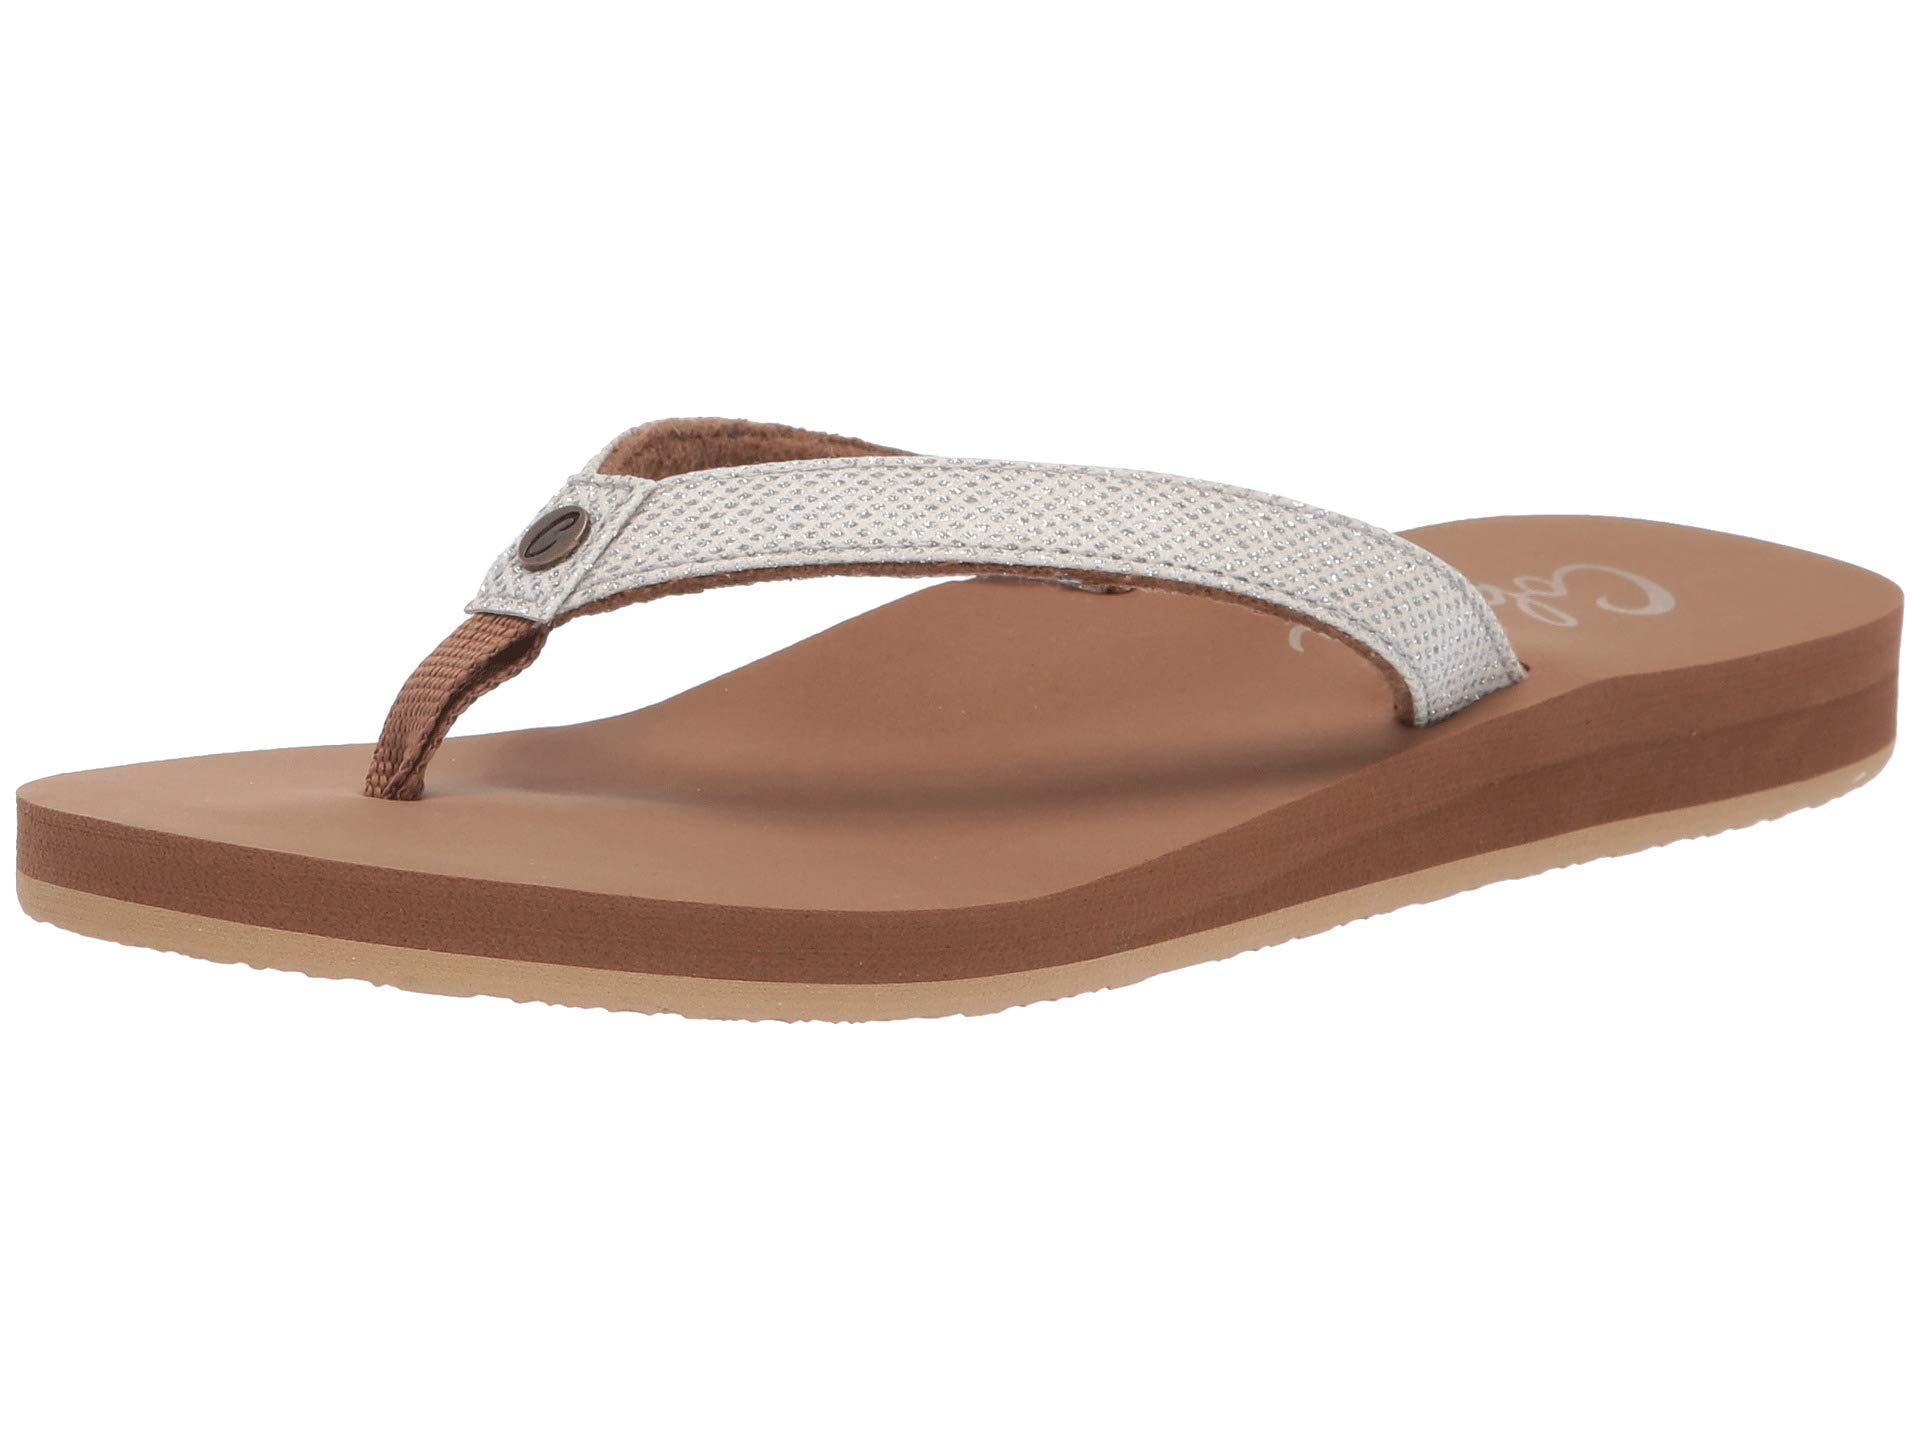 4f8911beb3e28 Cobian - White Fiesta Skinny Bounce (tan) Women s Sandals - Lyst. View  fullscreen